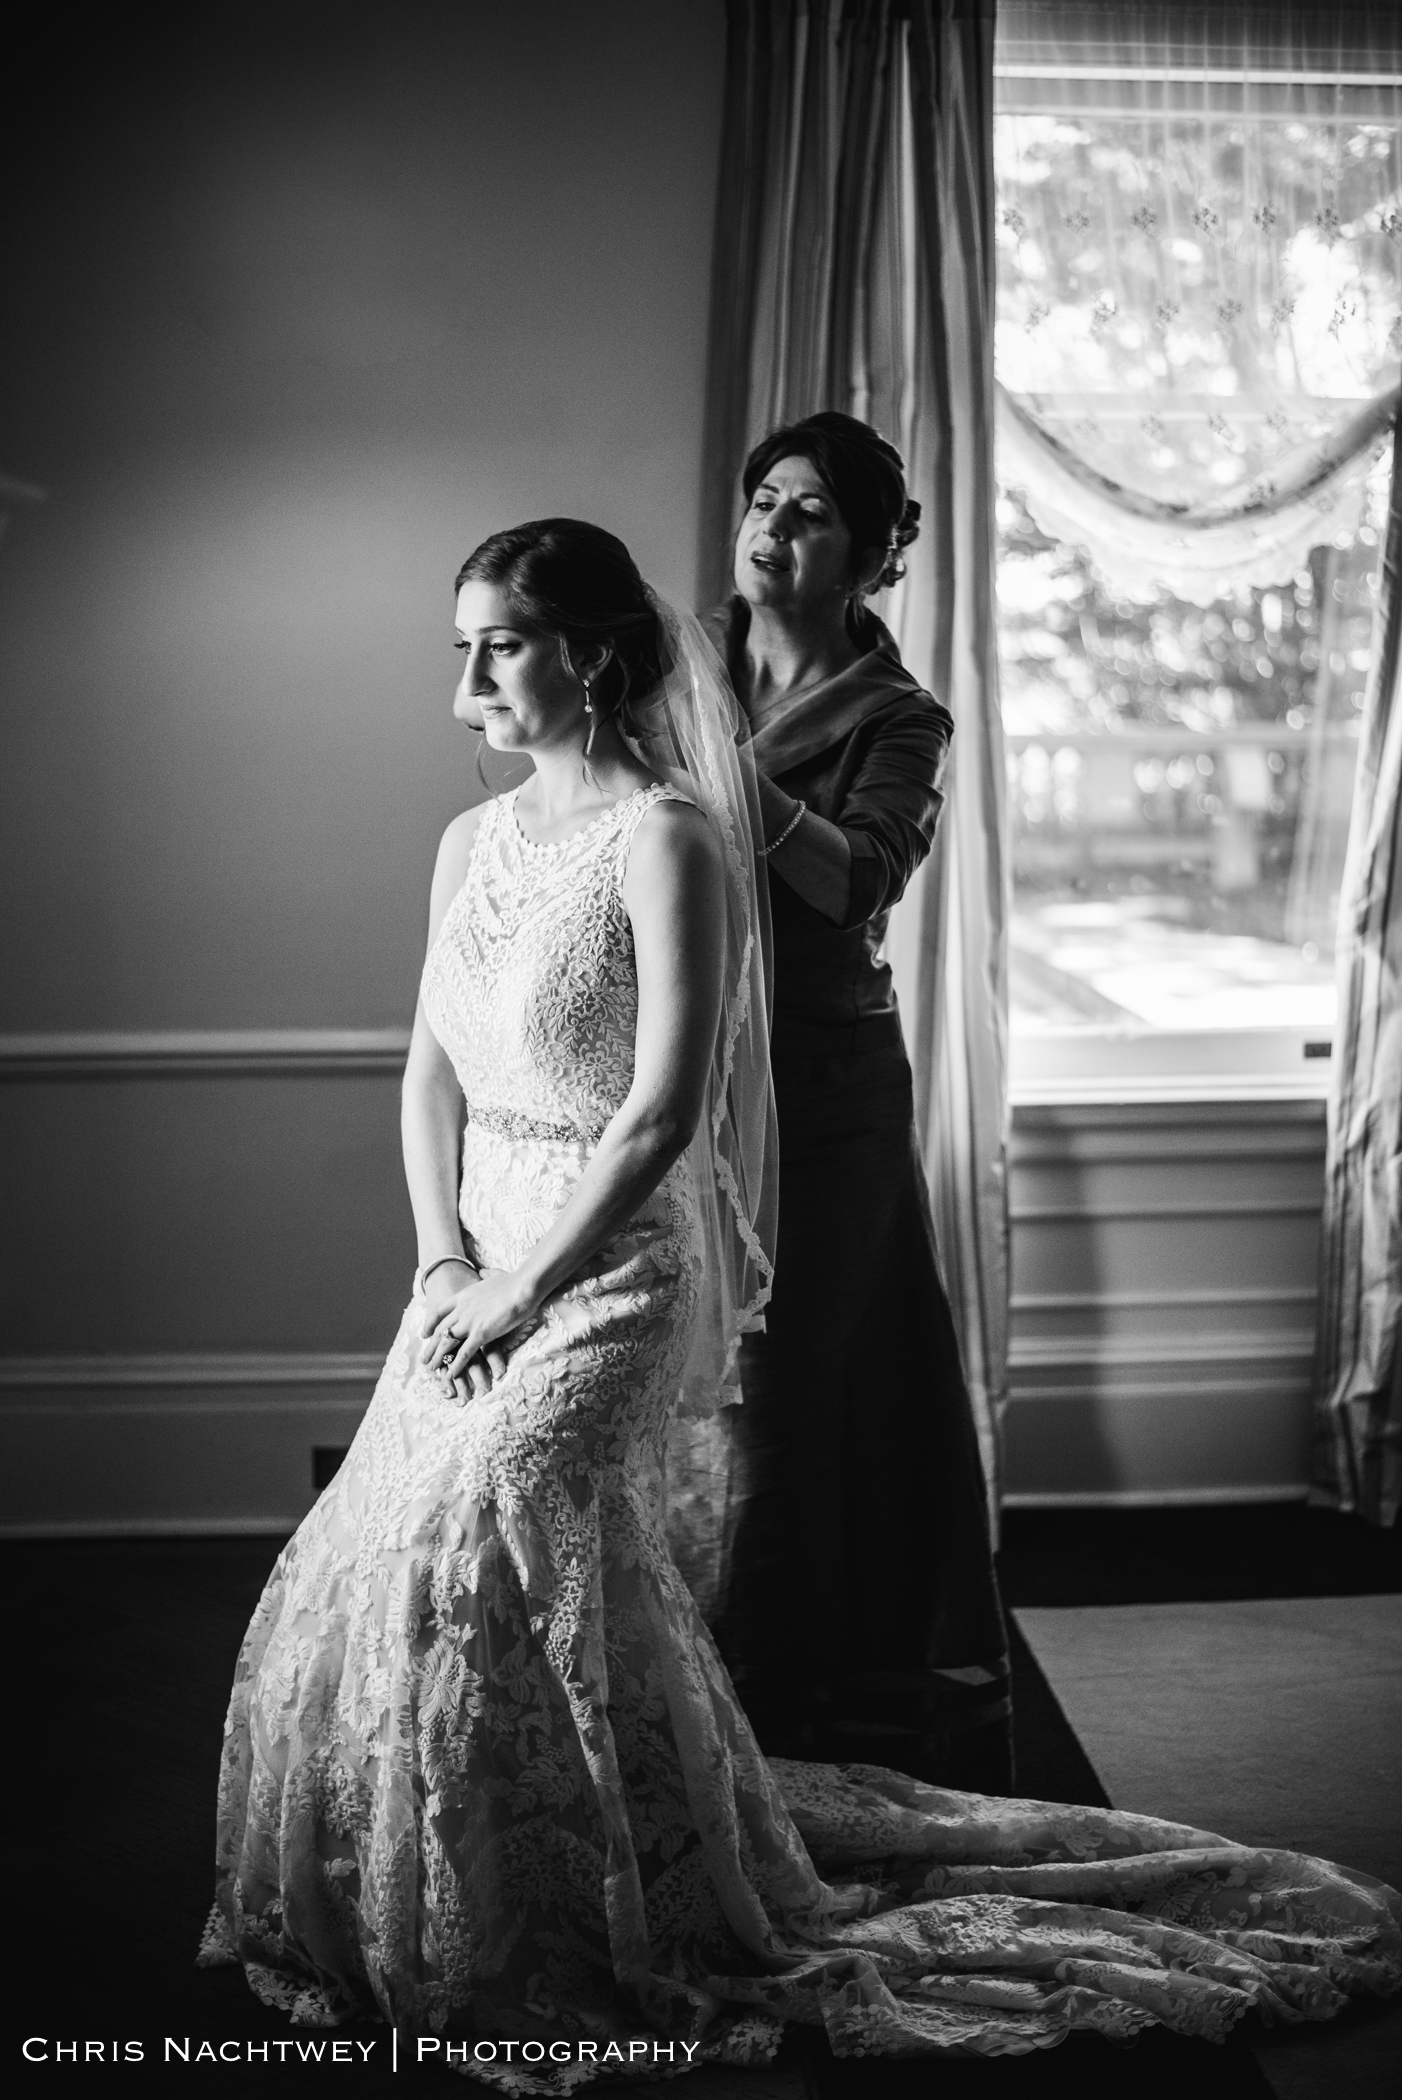 harkness-wedding-photos-chris-nachtwey-photography-2018-9.jpg